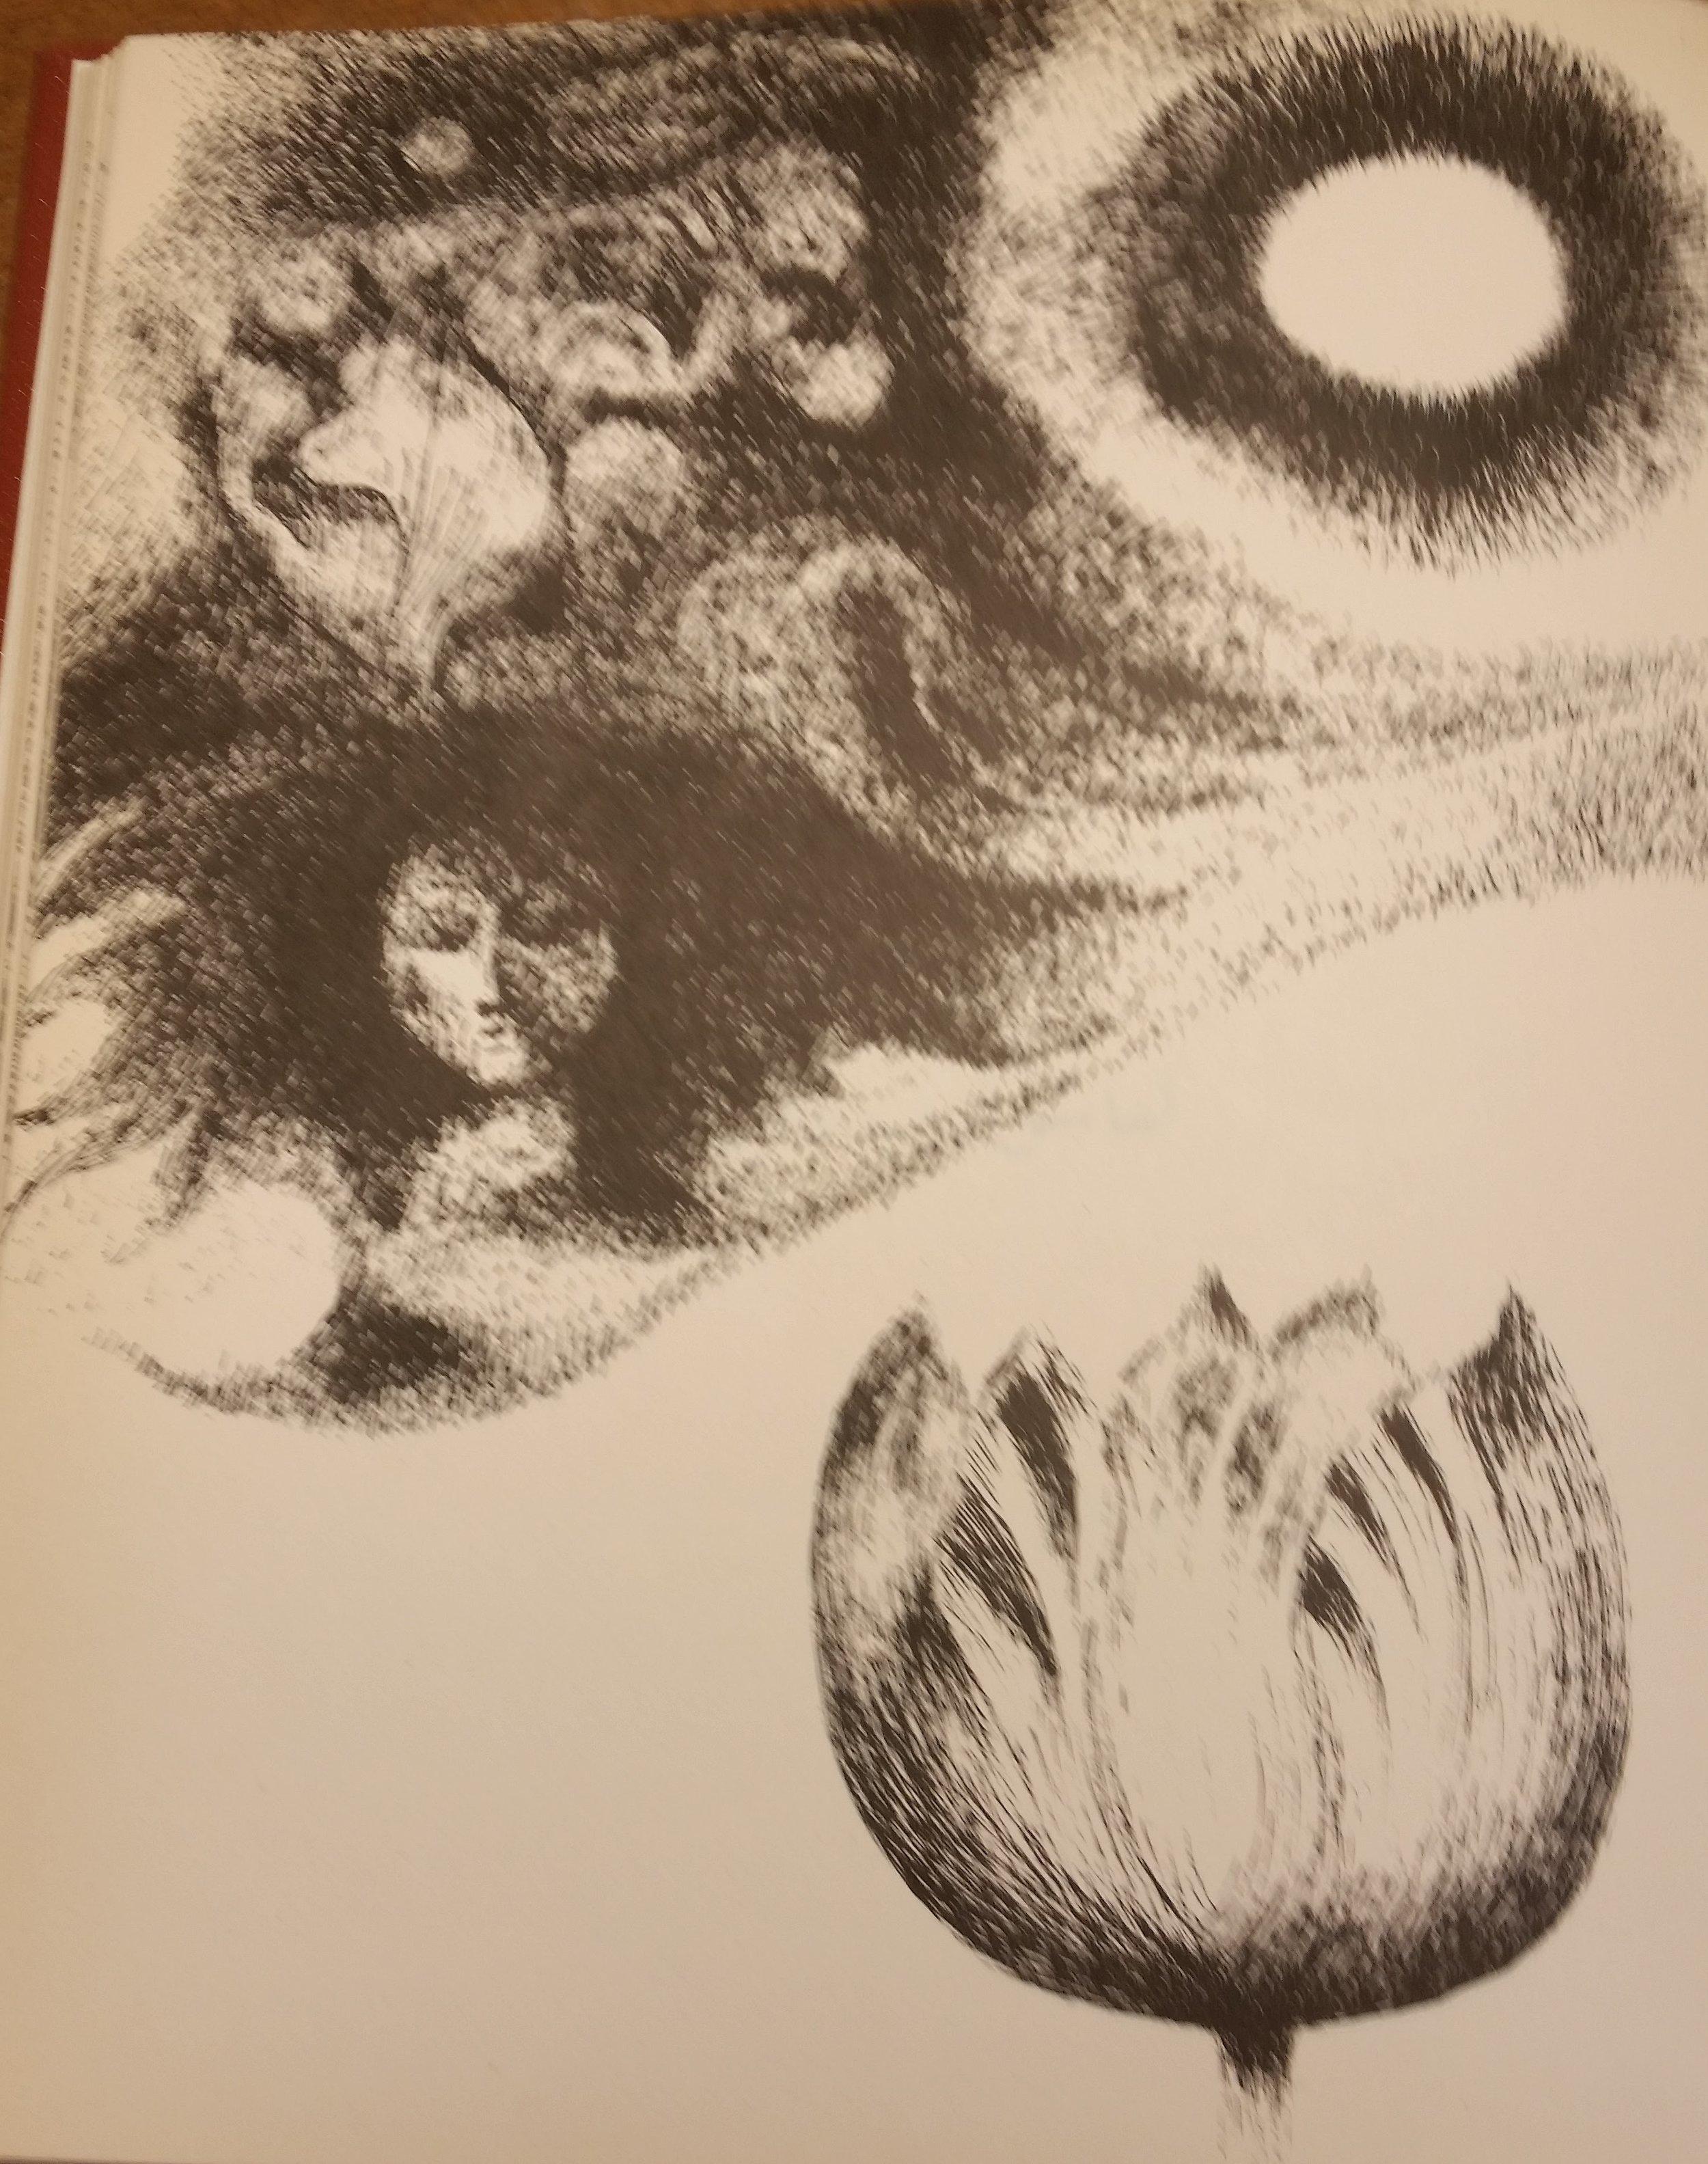 shiraz's moon - drawing 4